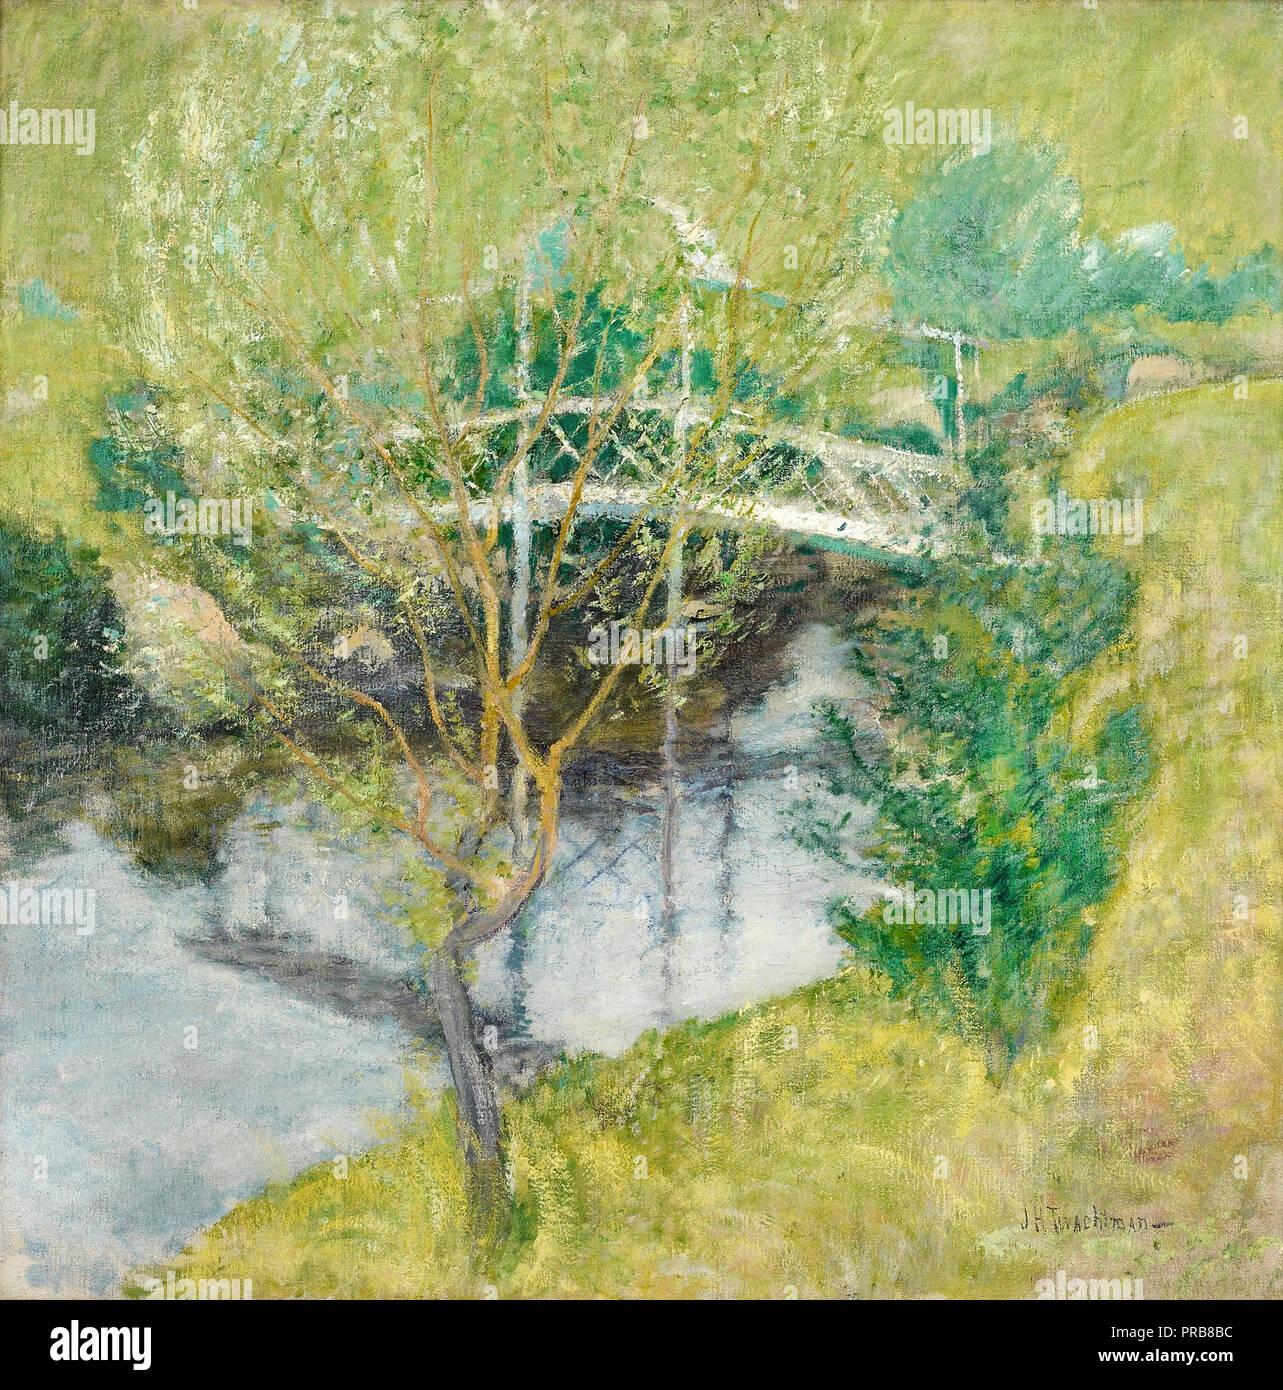 John Henry Twachtman, The White Bridge, Circa 1890-1900 Oil on canvas, Minneapolis Institute of Arts, USA. - Stock Image